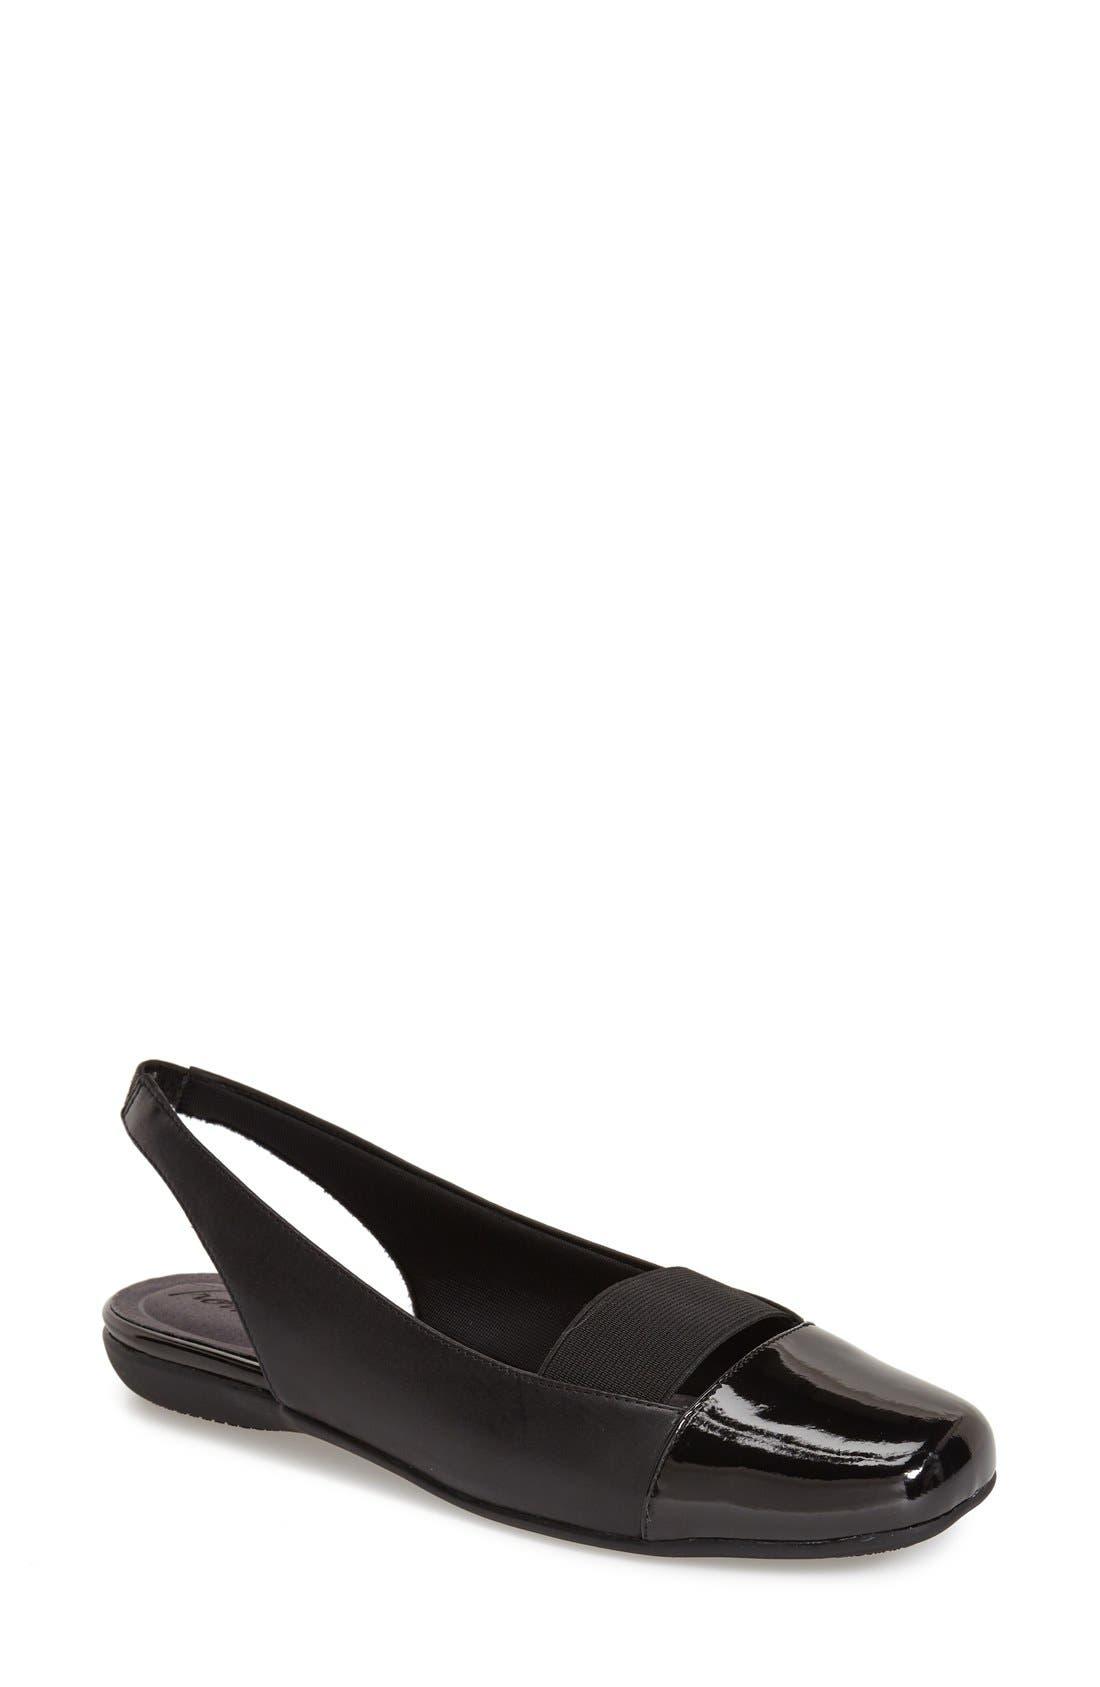 'Sarina' SlingbackFlat,                             Main thumbnail 1, color,                             Black Leather